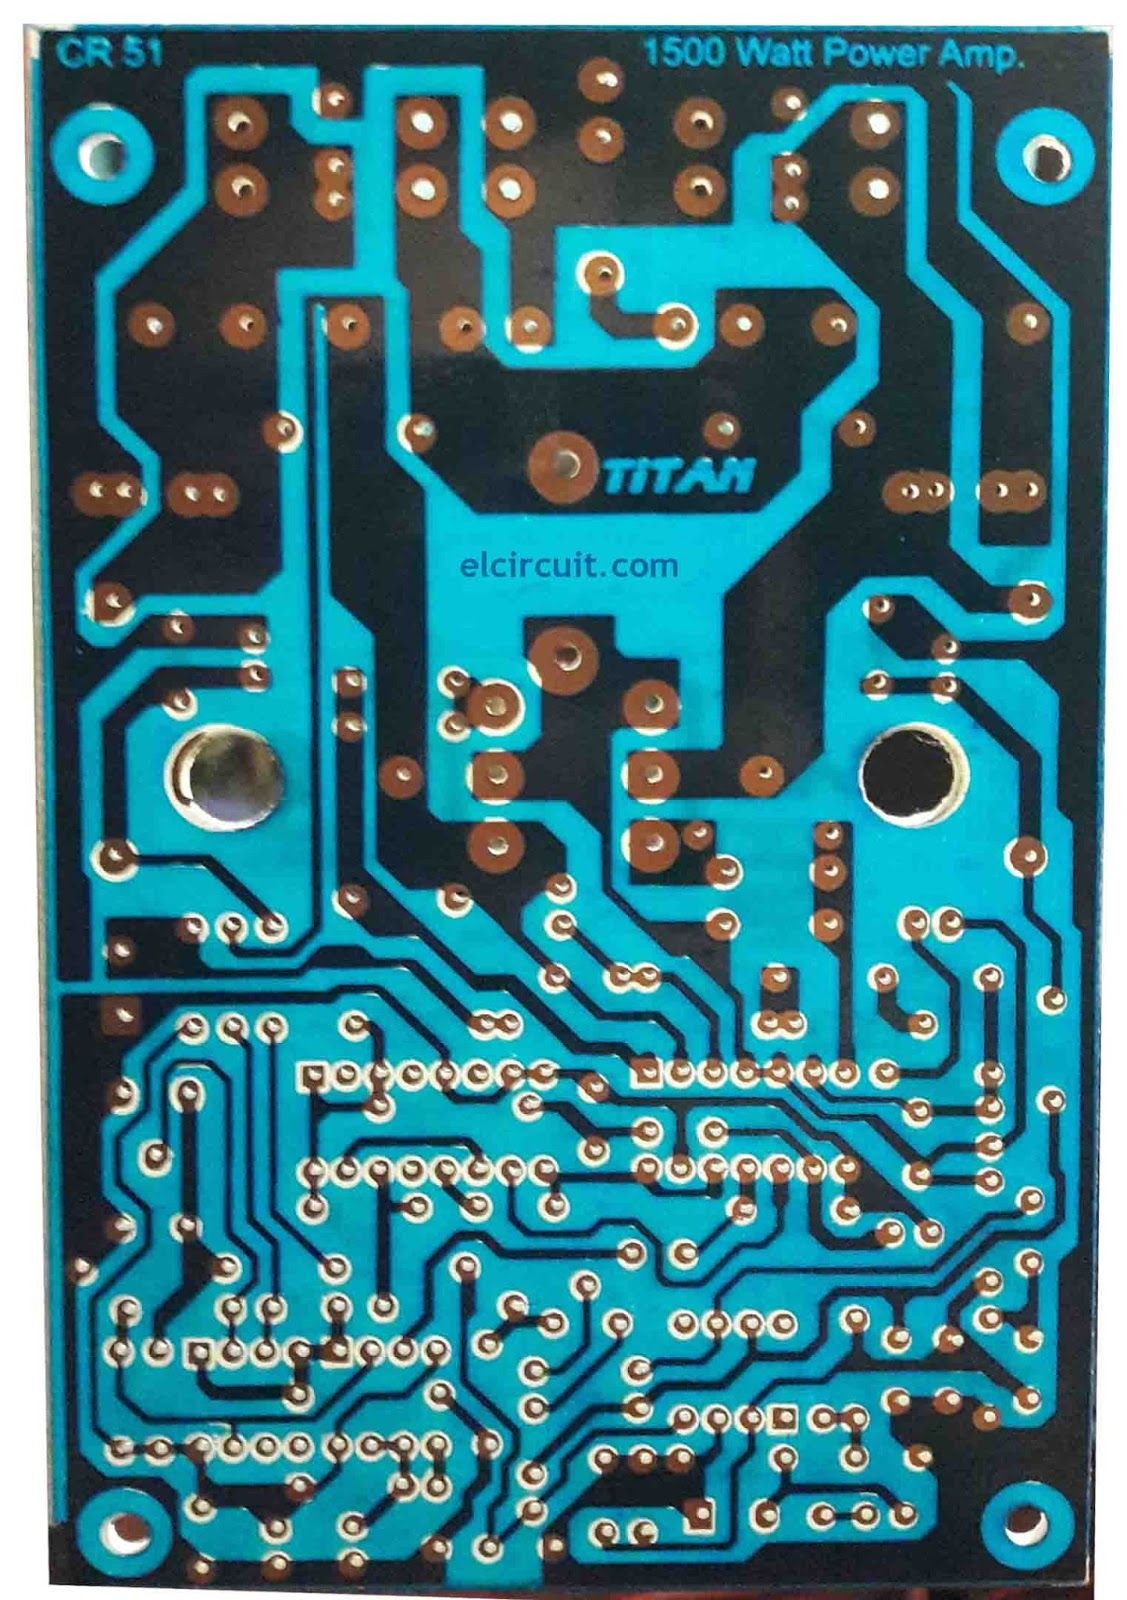 Super Bass Power Amplifier 2sc29222sa1216 Ampli Amp Loa Ocl 80w Hifi By Ic Tda2020 Electronic Projects Circuits Class D